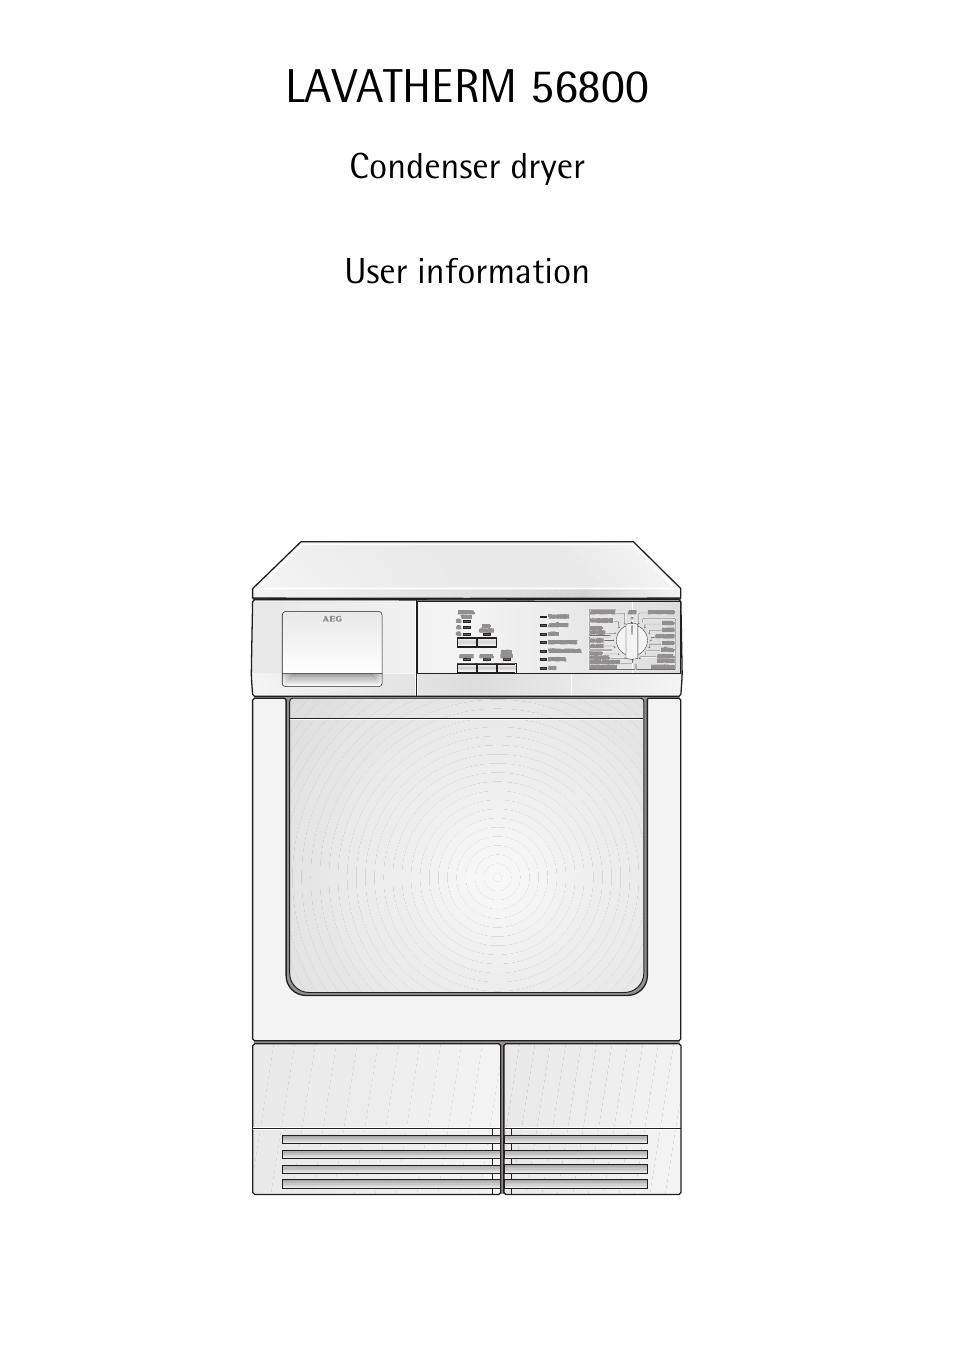 Aeg lavatherm 56800 инструкция